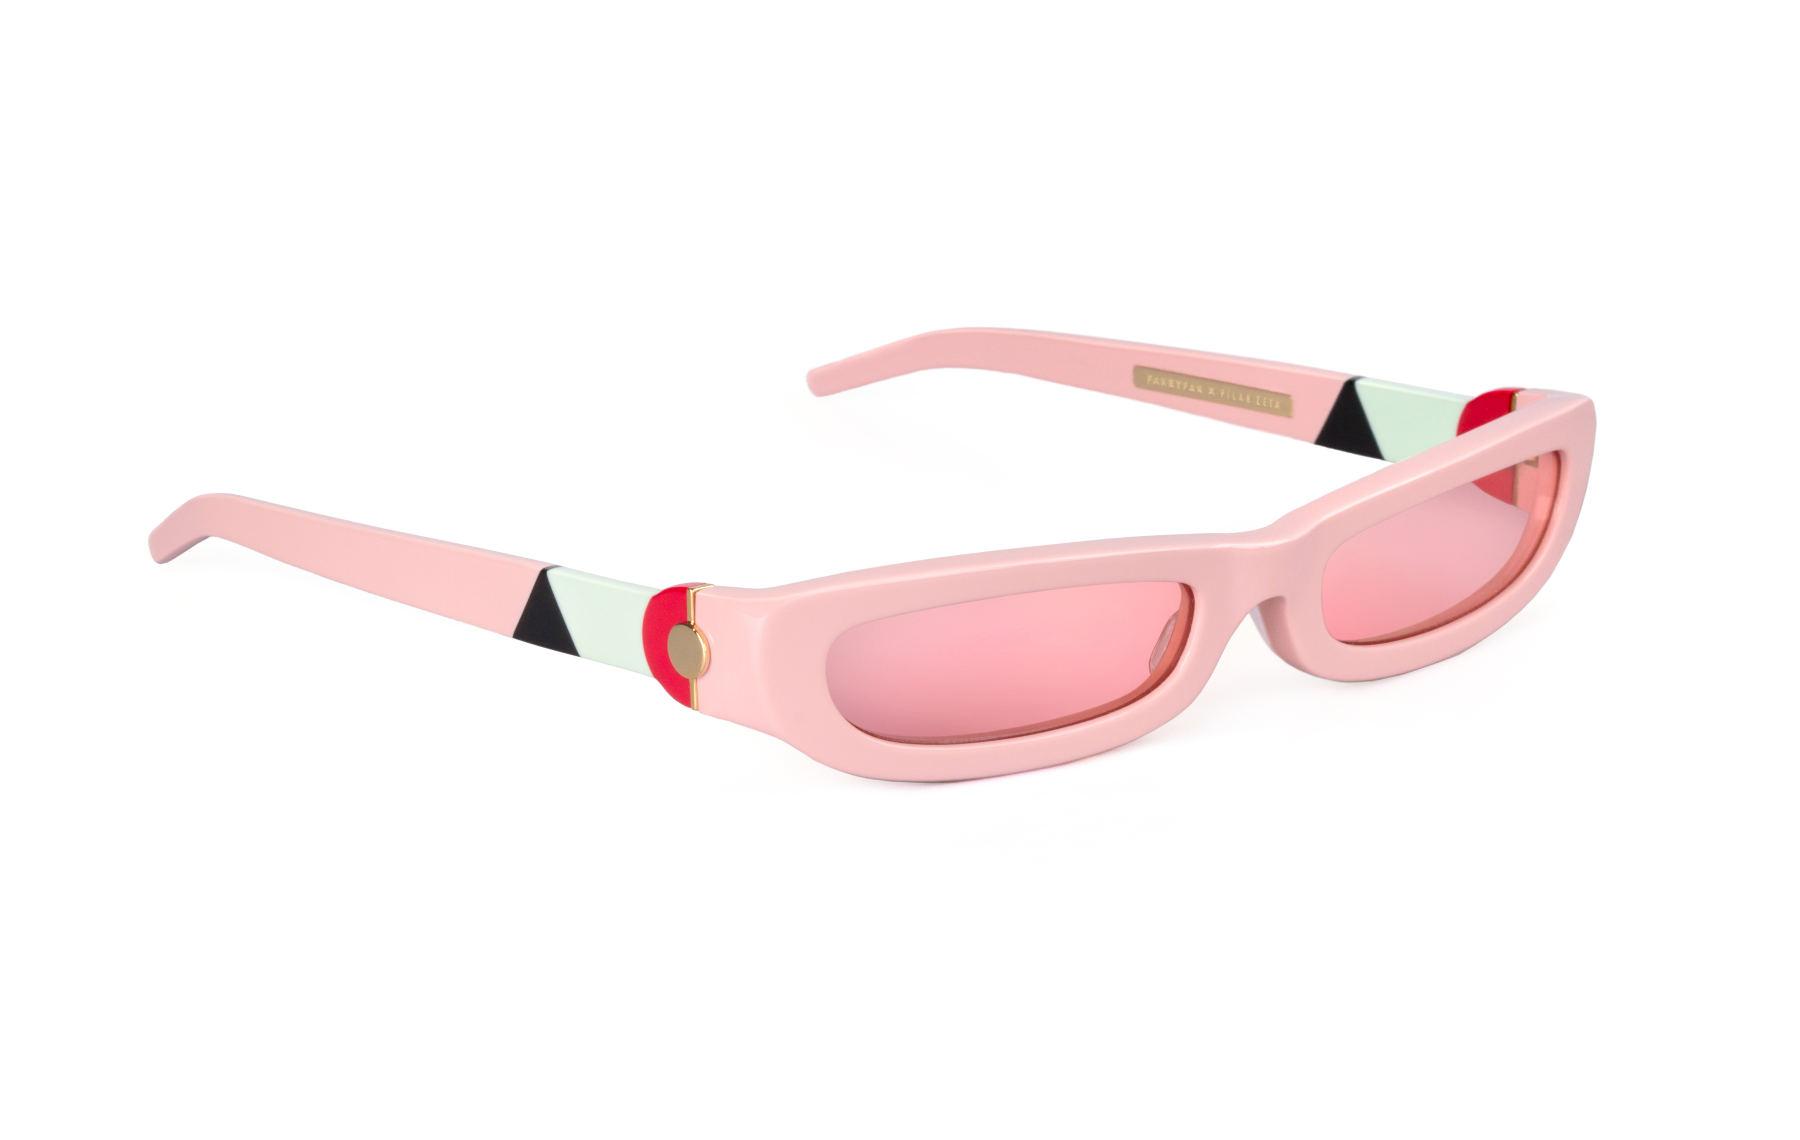 FAKBYFAK x Pilar Zeta  SHARP. Sunglasses. Glossy Pink Code: FBF-14-01-05